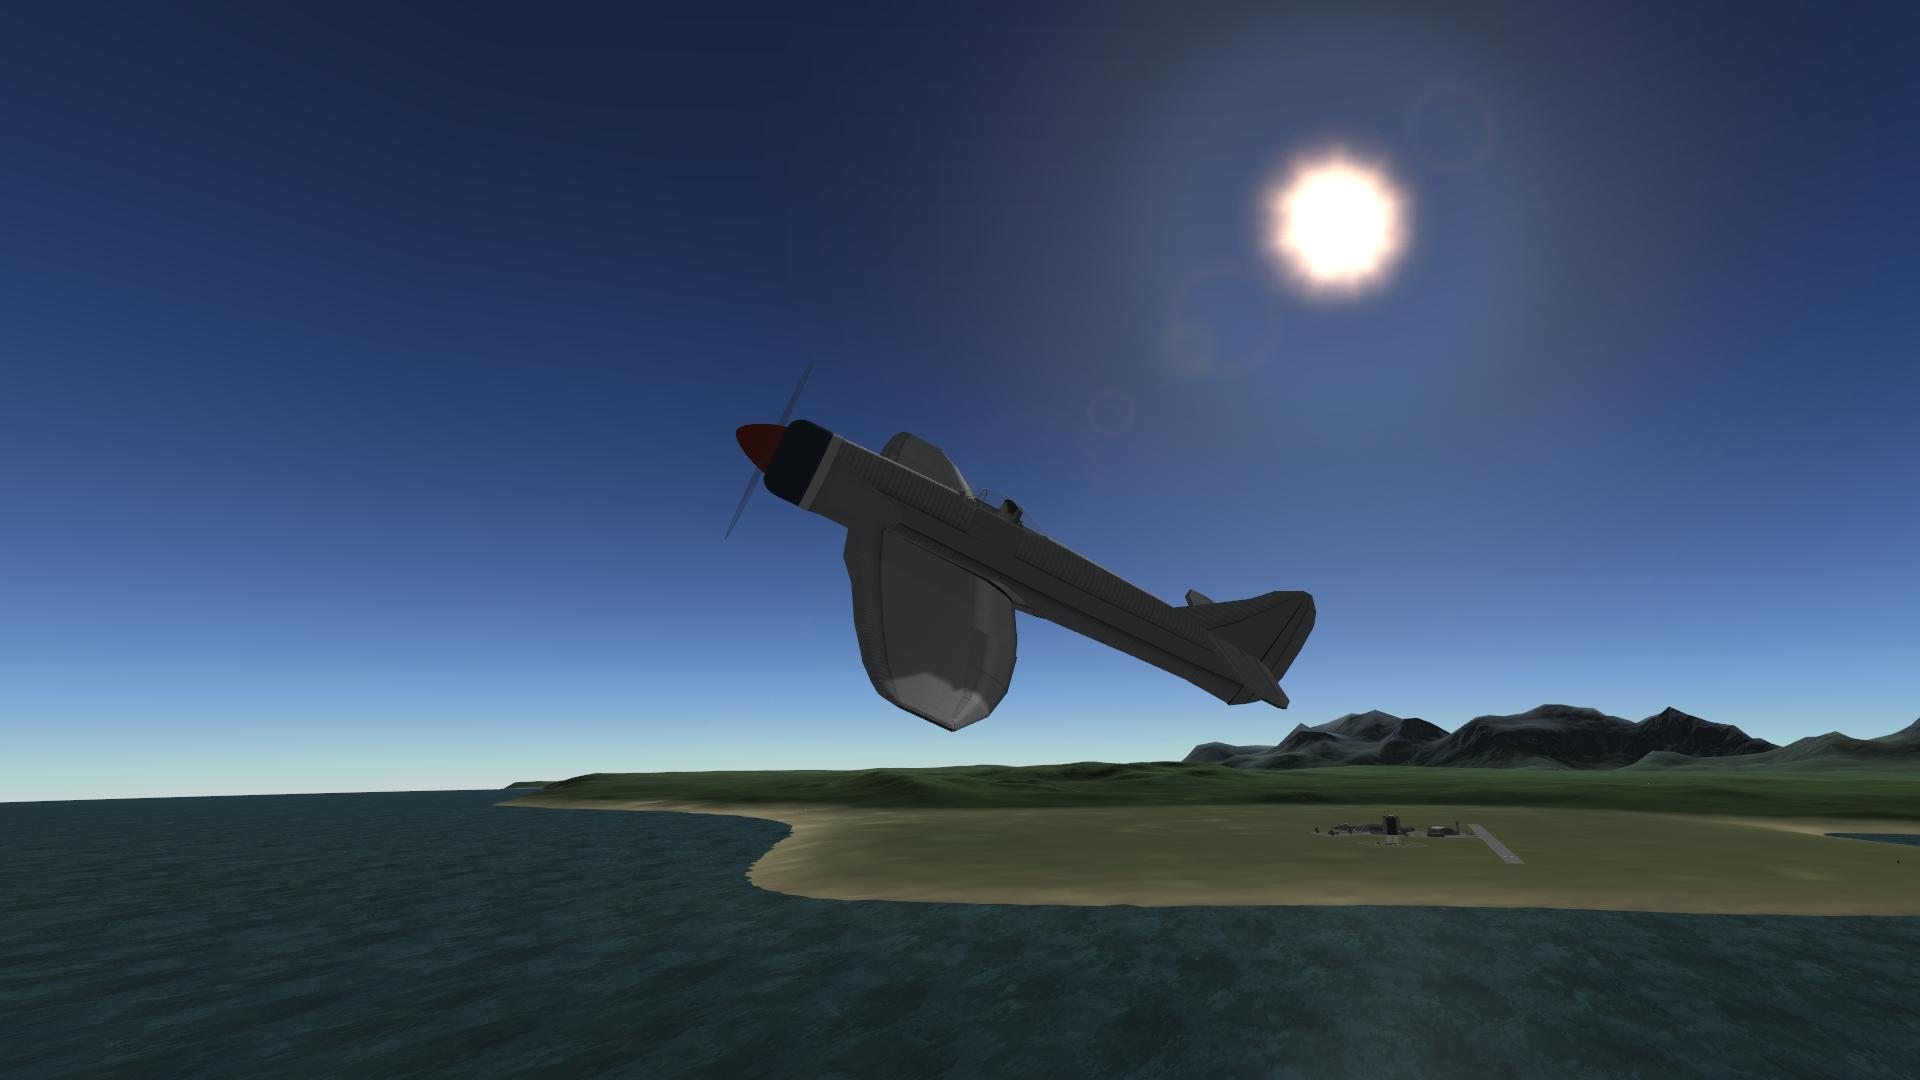 Screenshot3 by LythroA